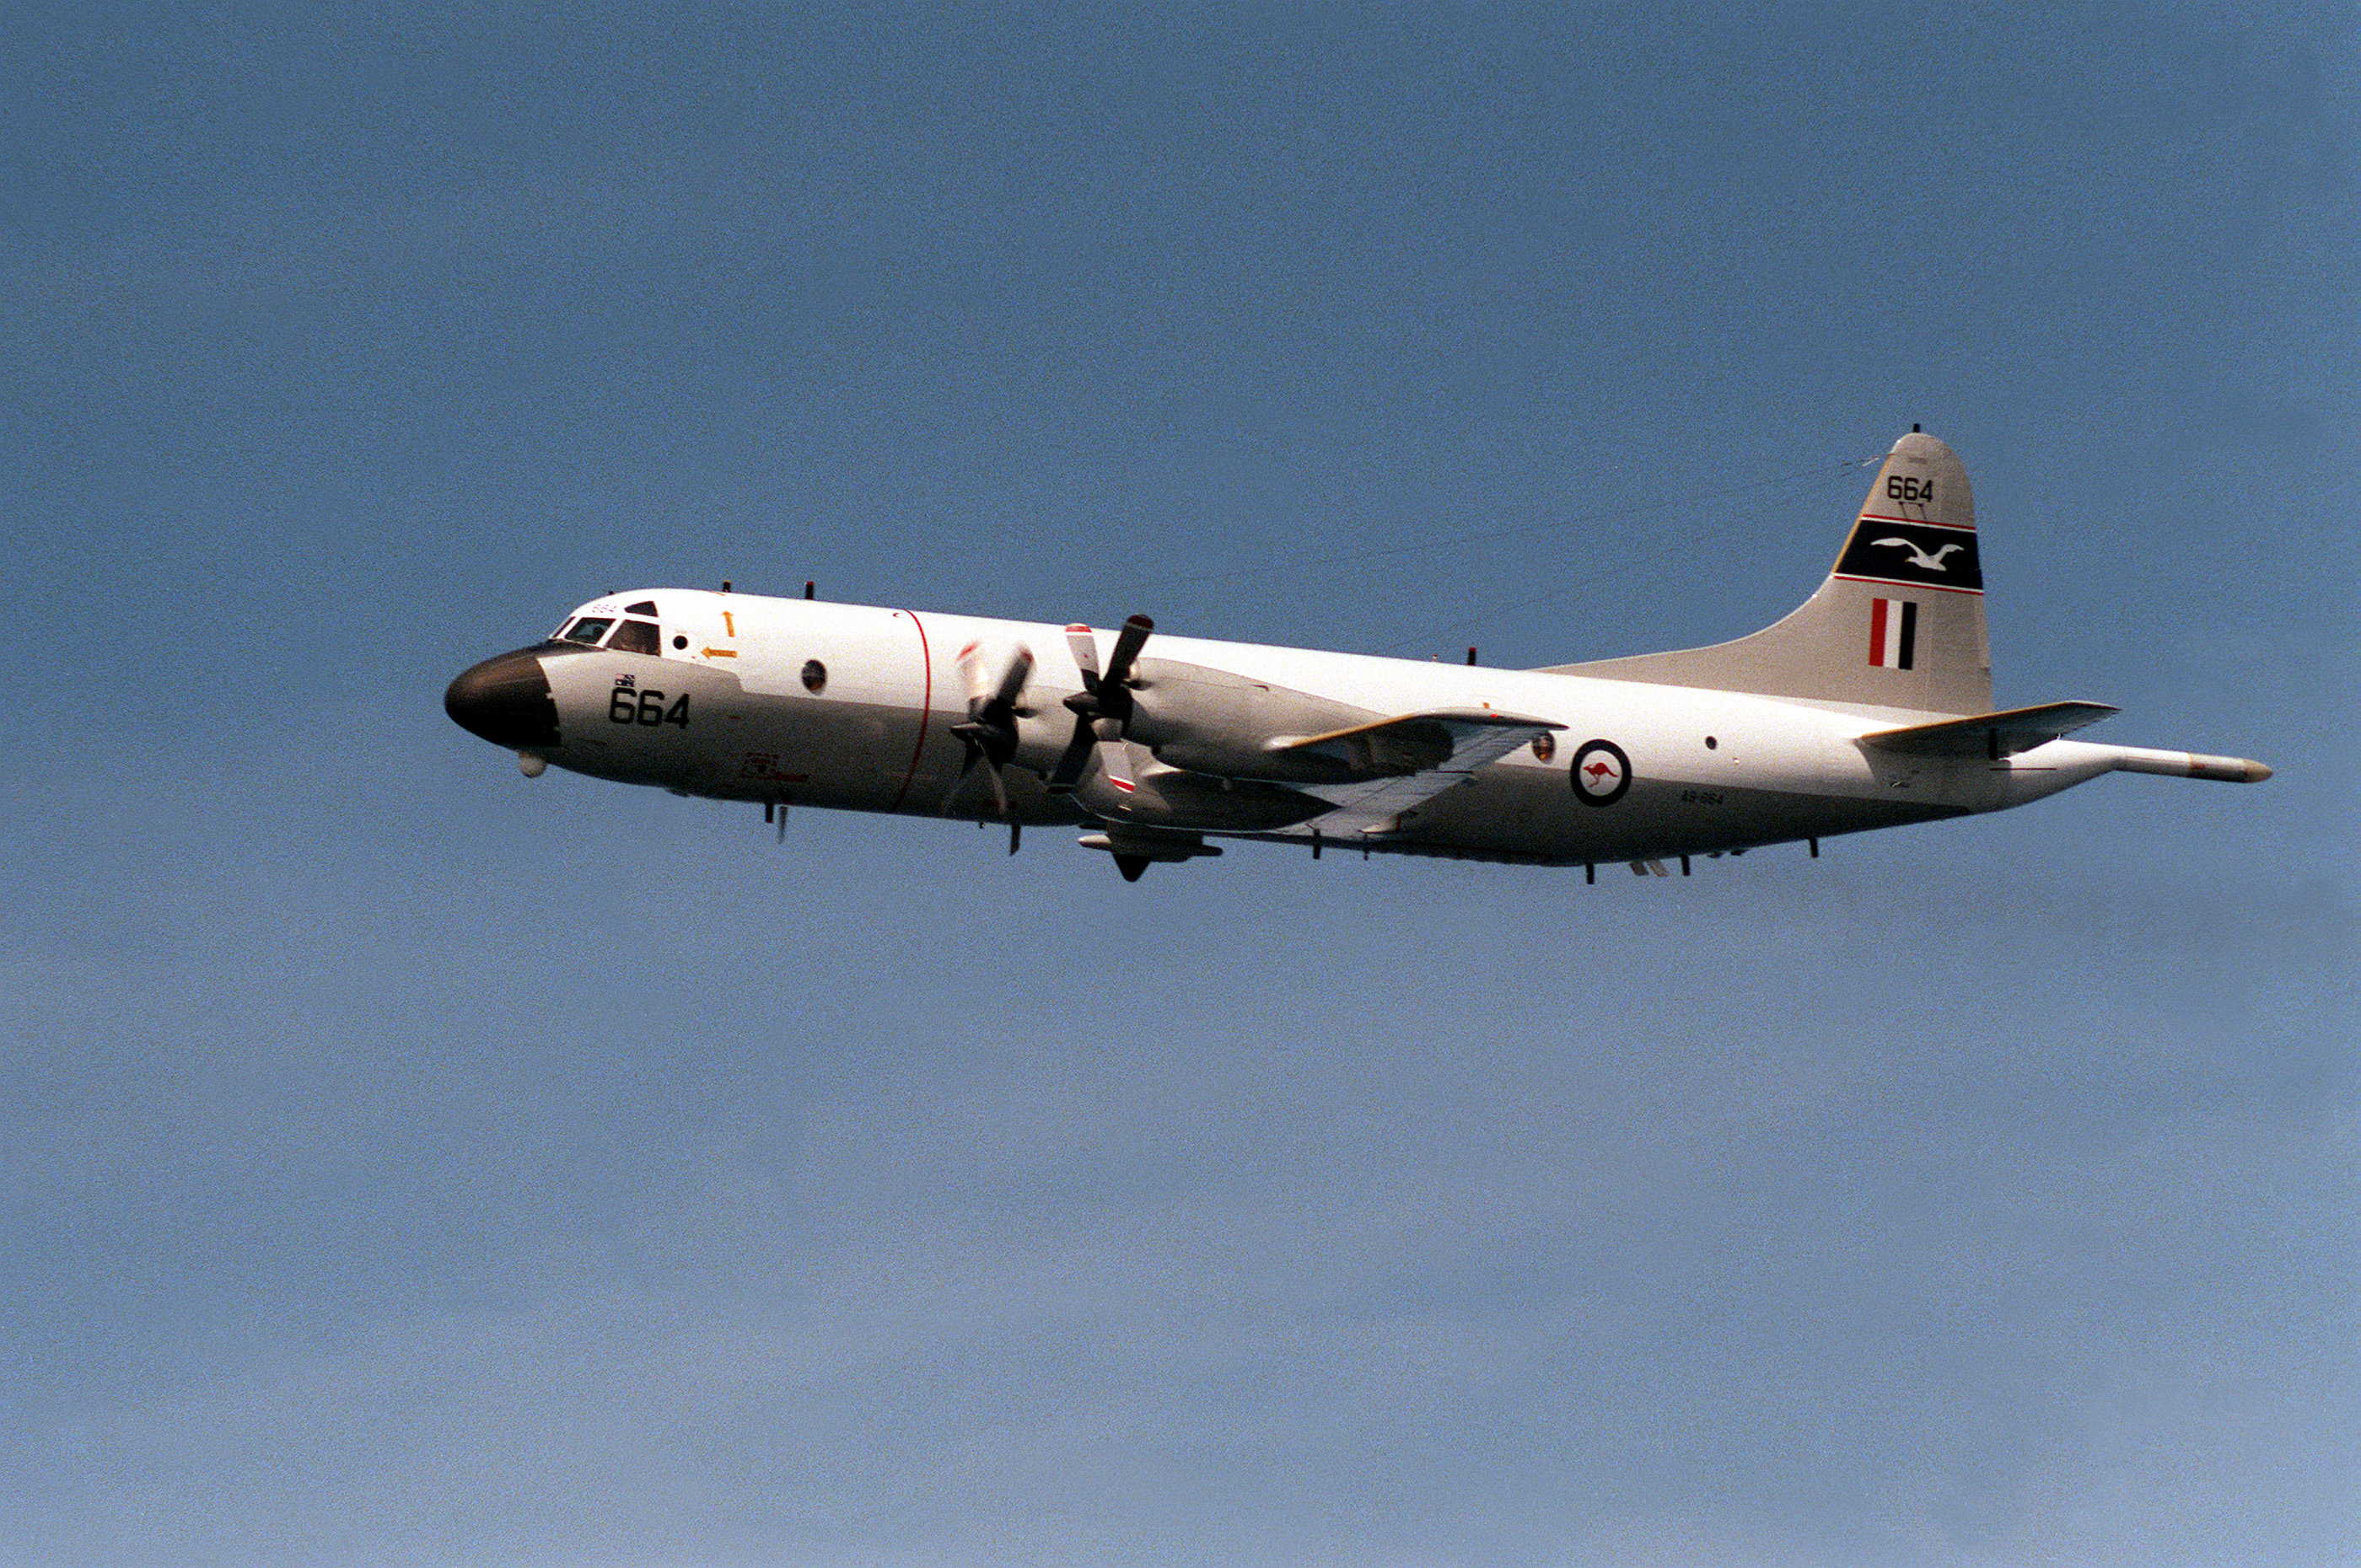 P-3C, 11 Sqn RAAF, in 1990